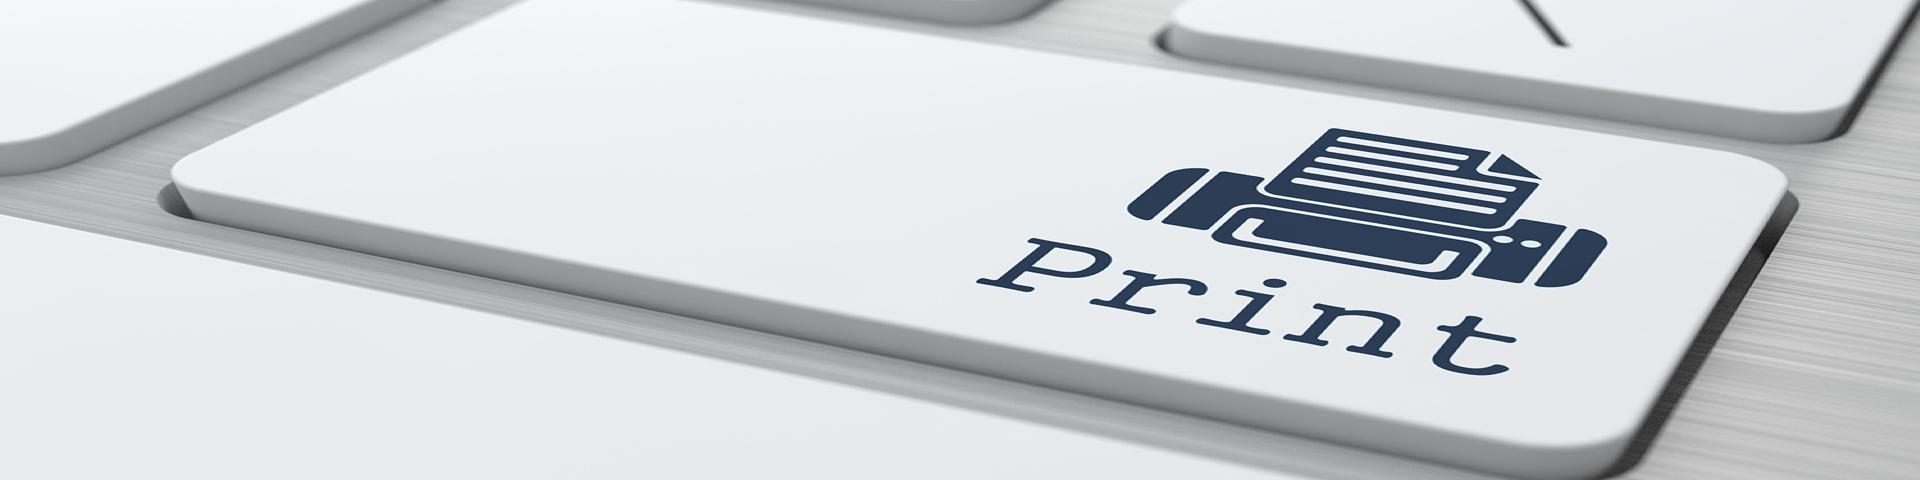 Slider web2print